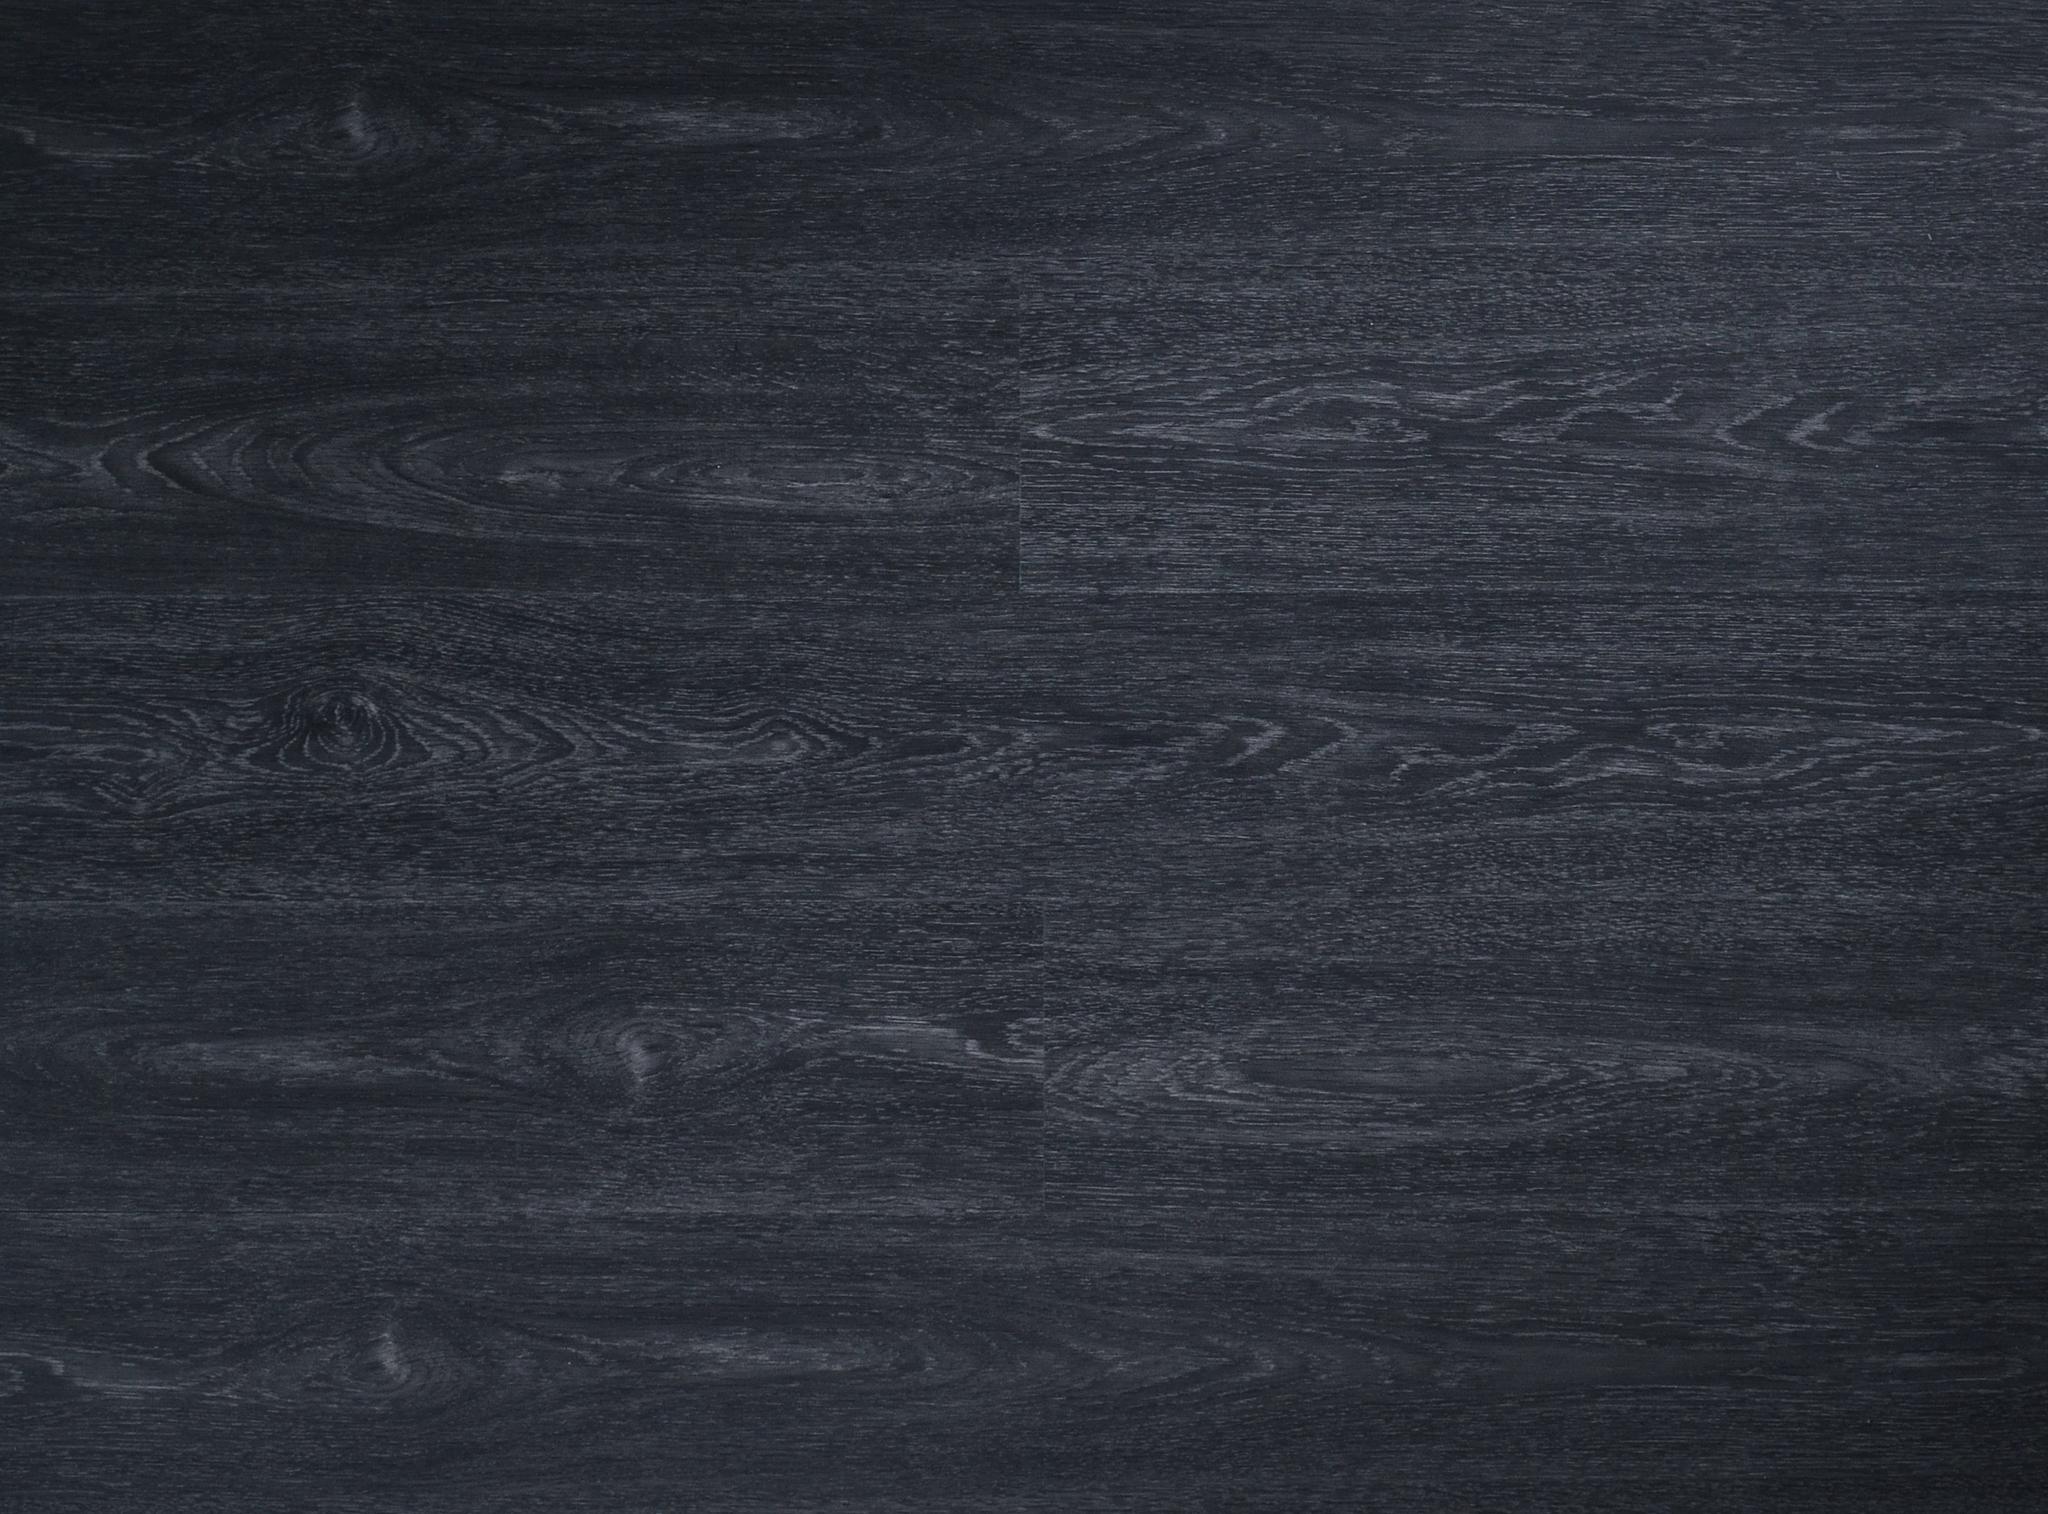 Виниловый пол Concept Floor - Fit Line Eiche Blackmoor (Дуб Blackmoor)